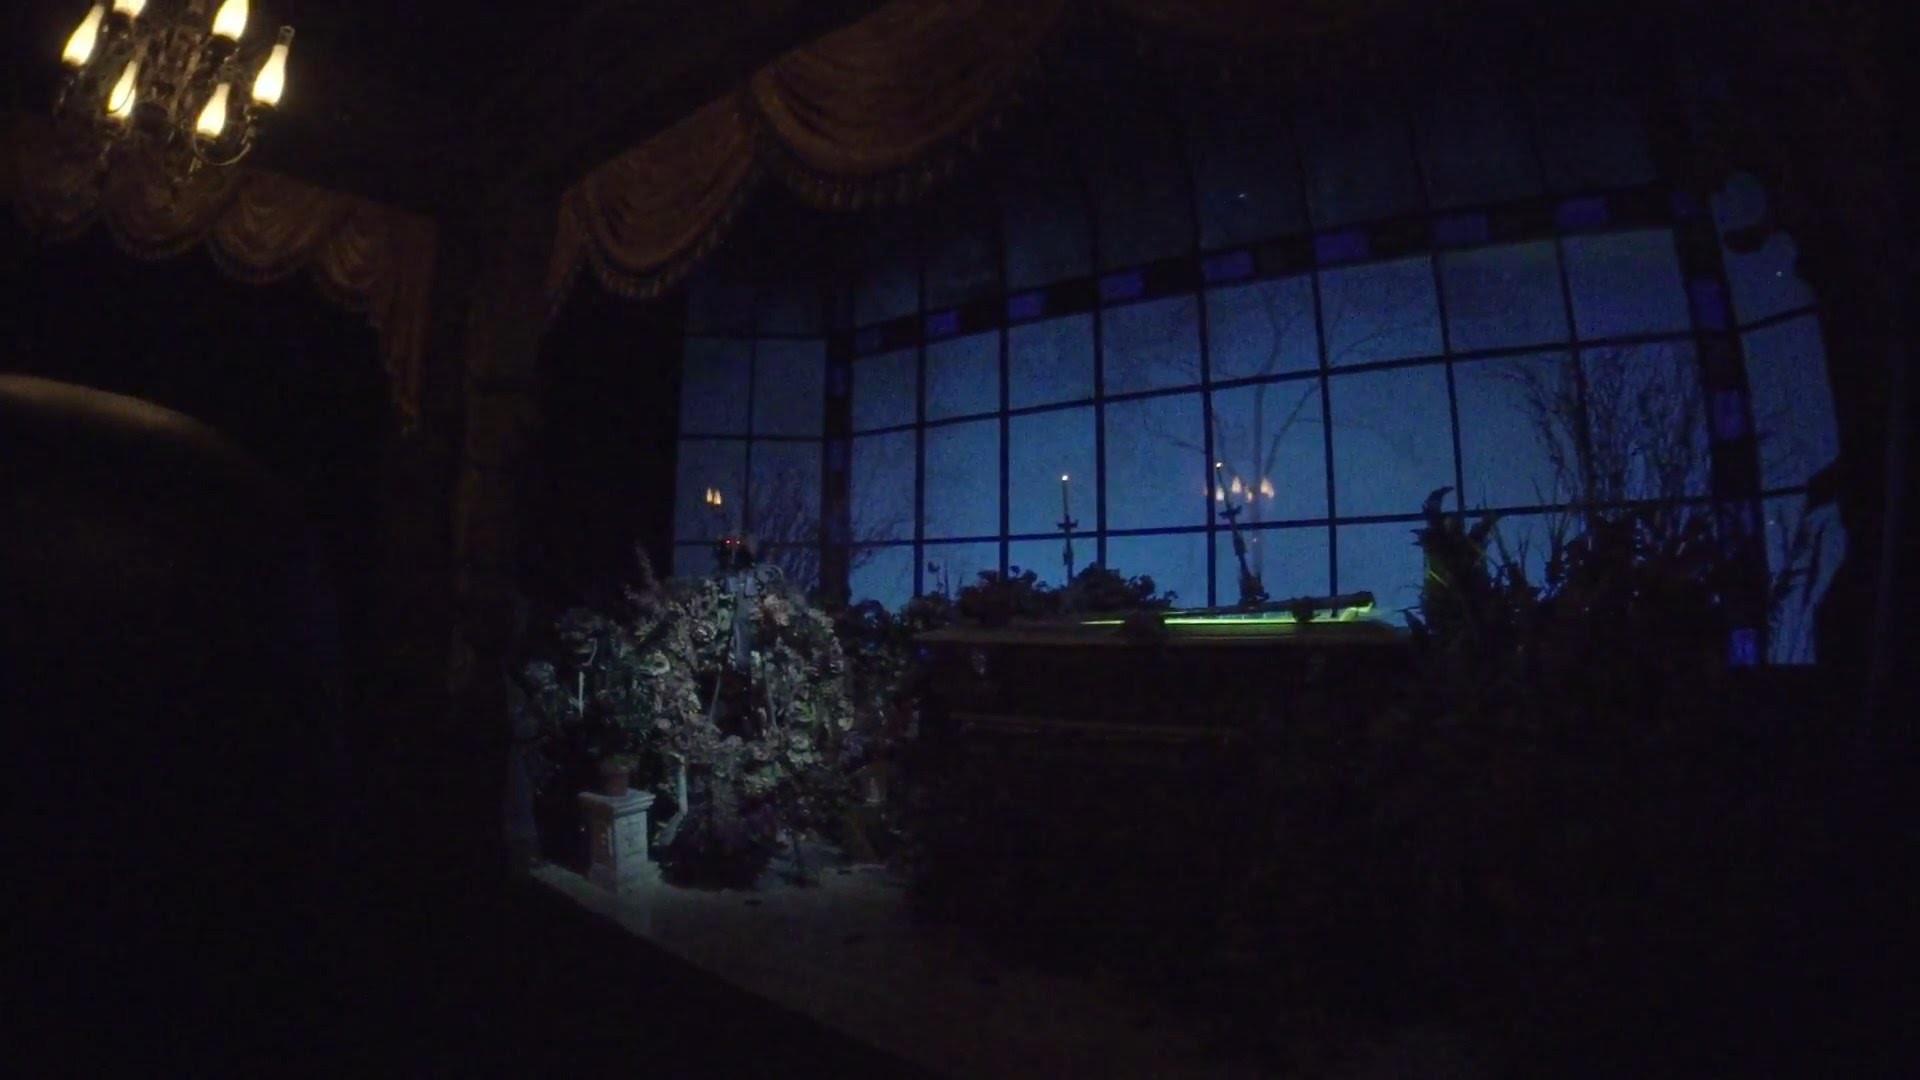 Haunted Mansion Low Light, Magic Kingdom, Walt Disney World HD 1080p 60fps